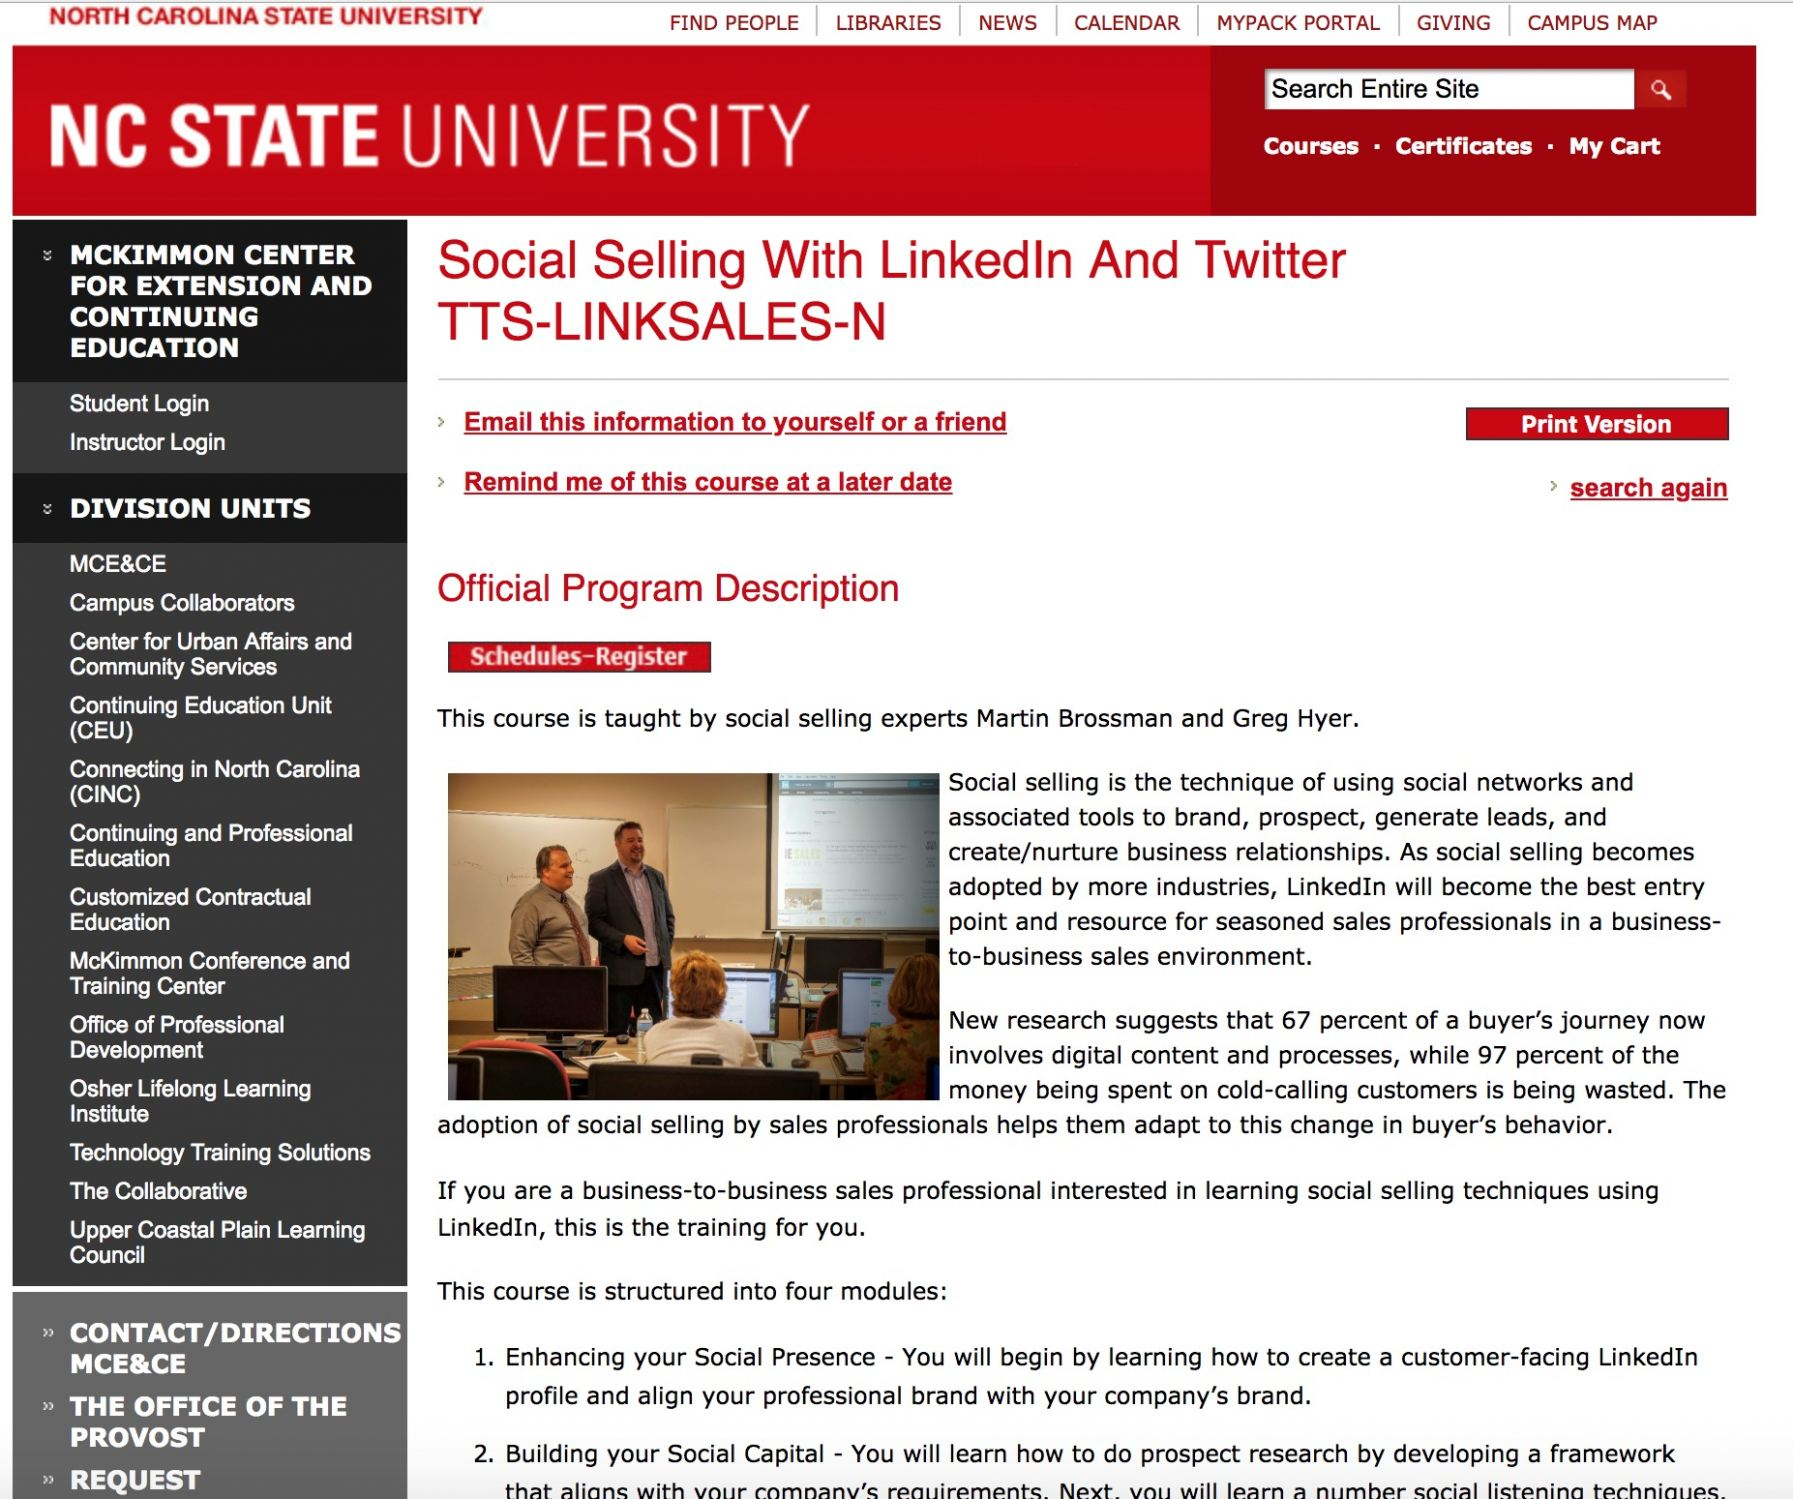 Social Selling at McKimmon Center